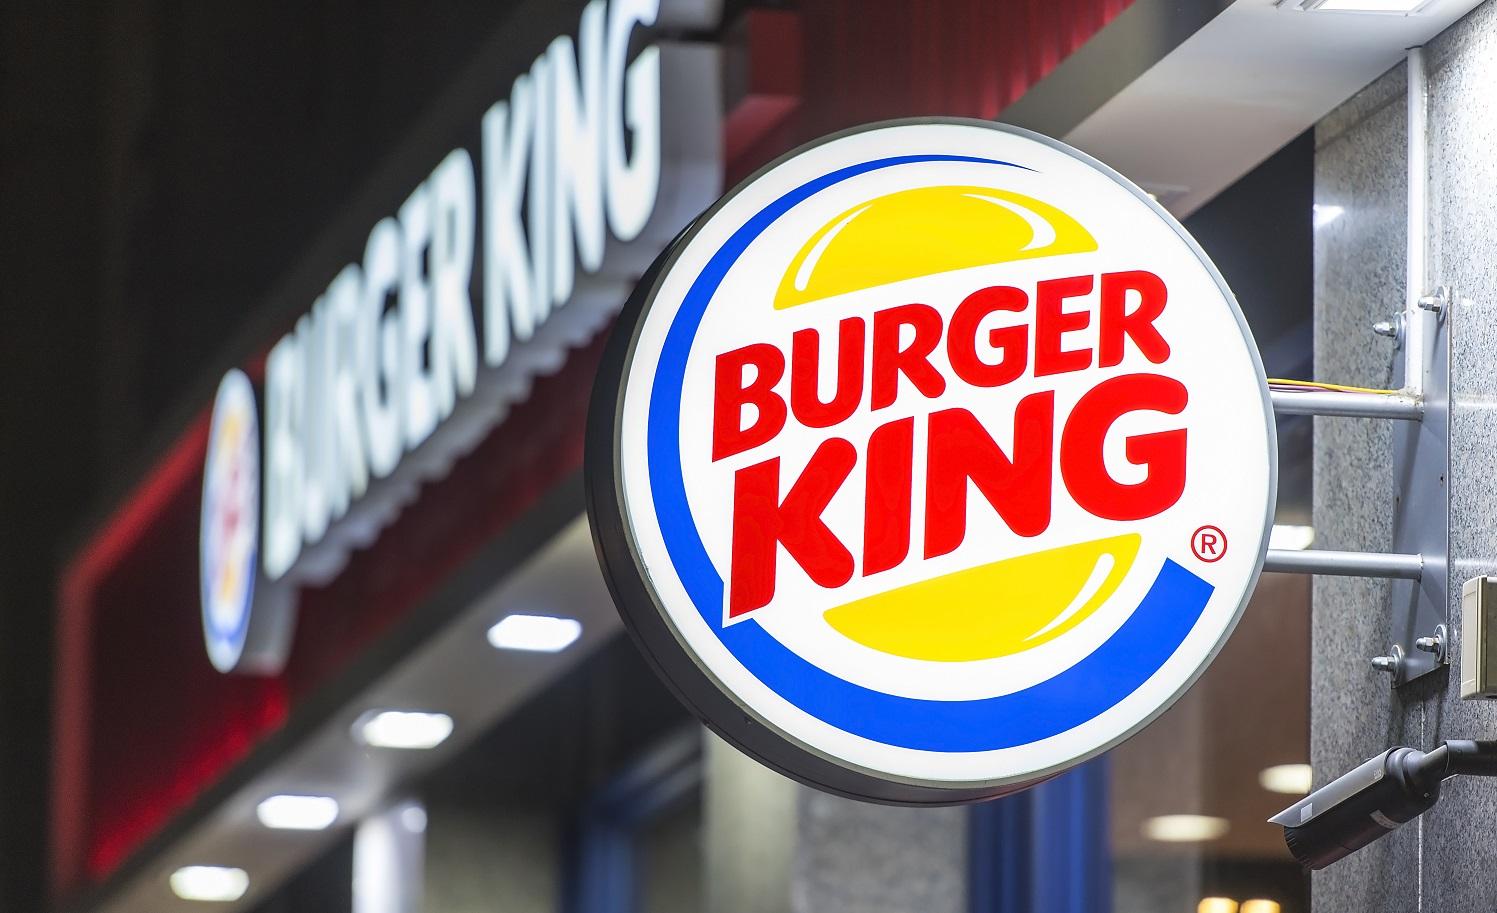 burger king logo เบอร์เกอร์คิง